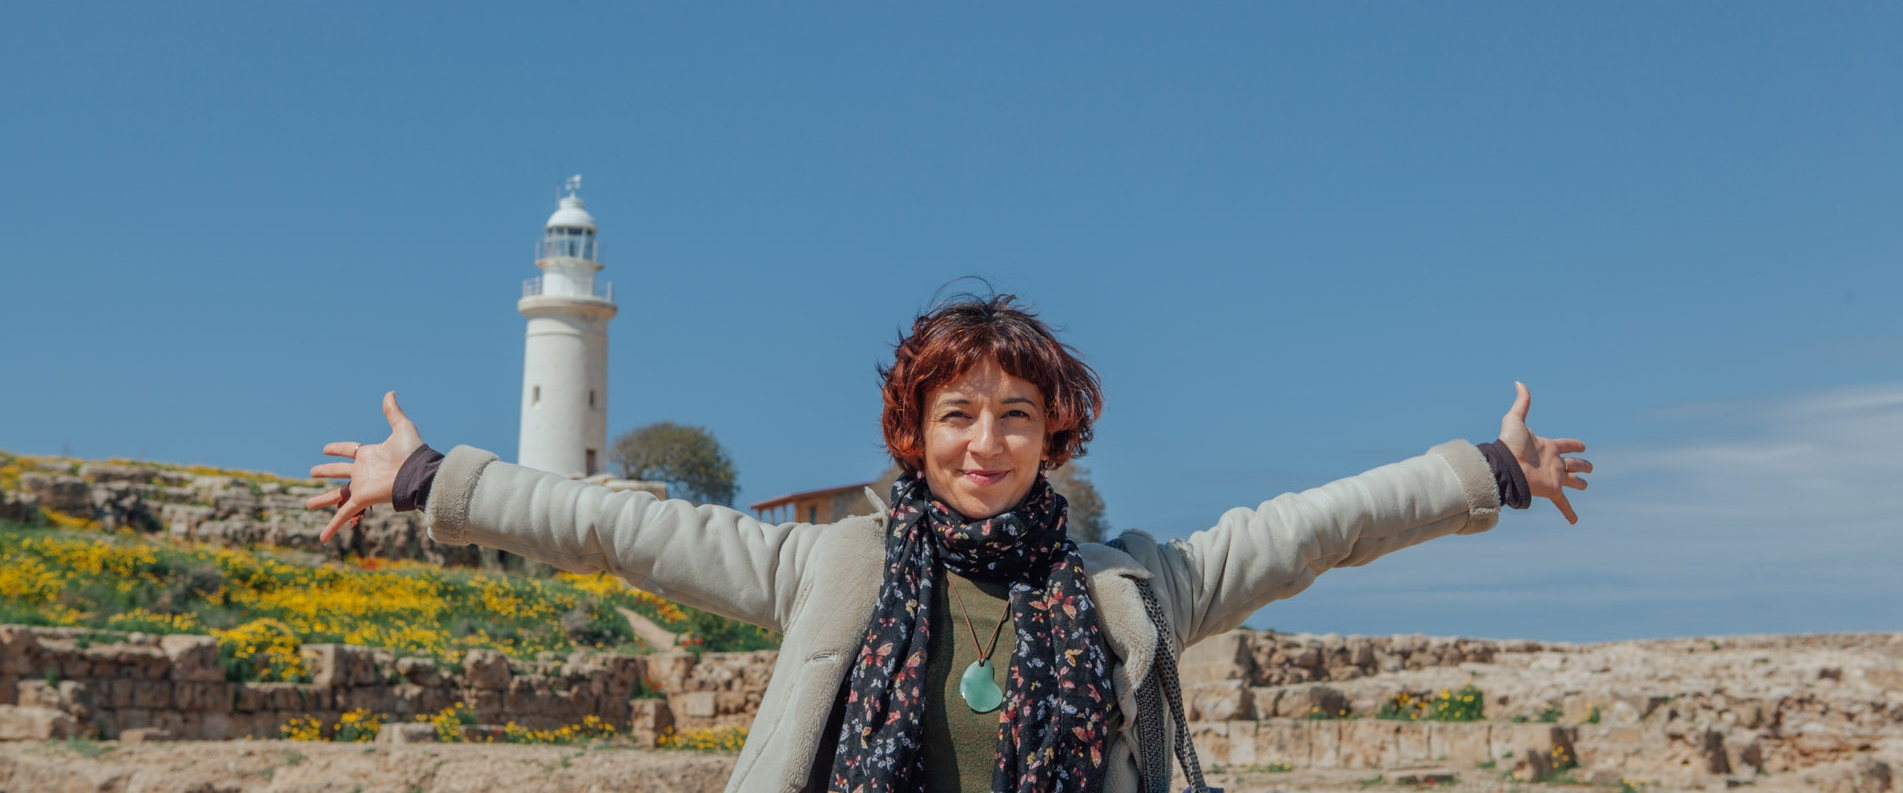 Erica Charalambous: Paradise Island in my Heart